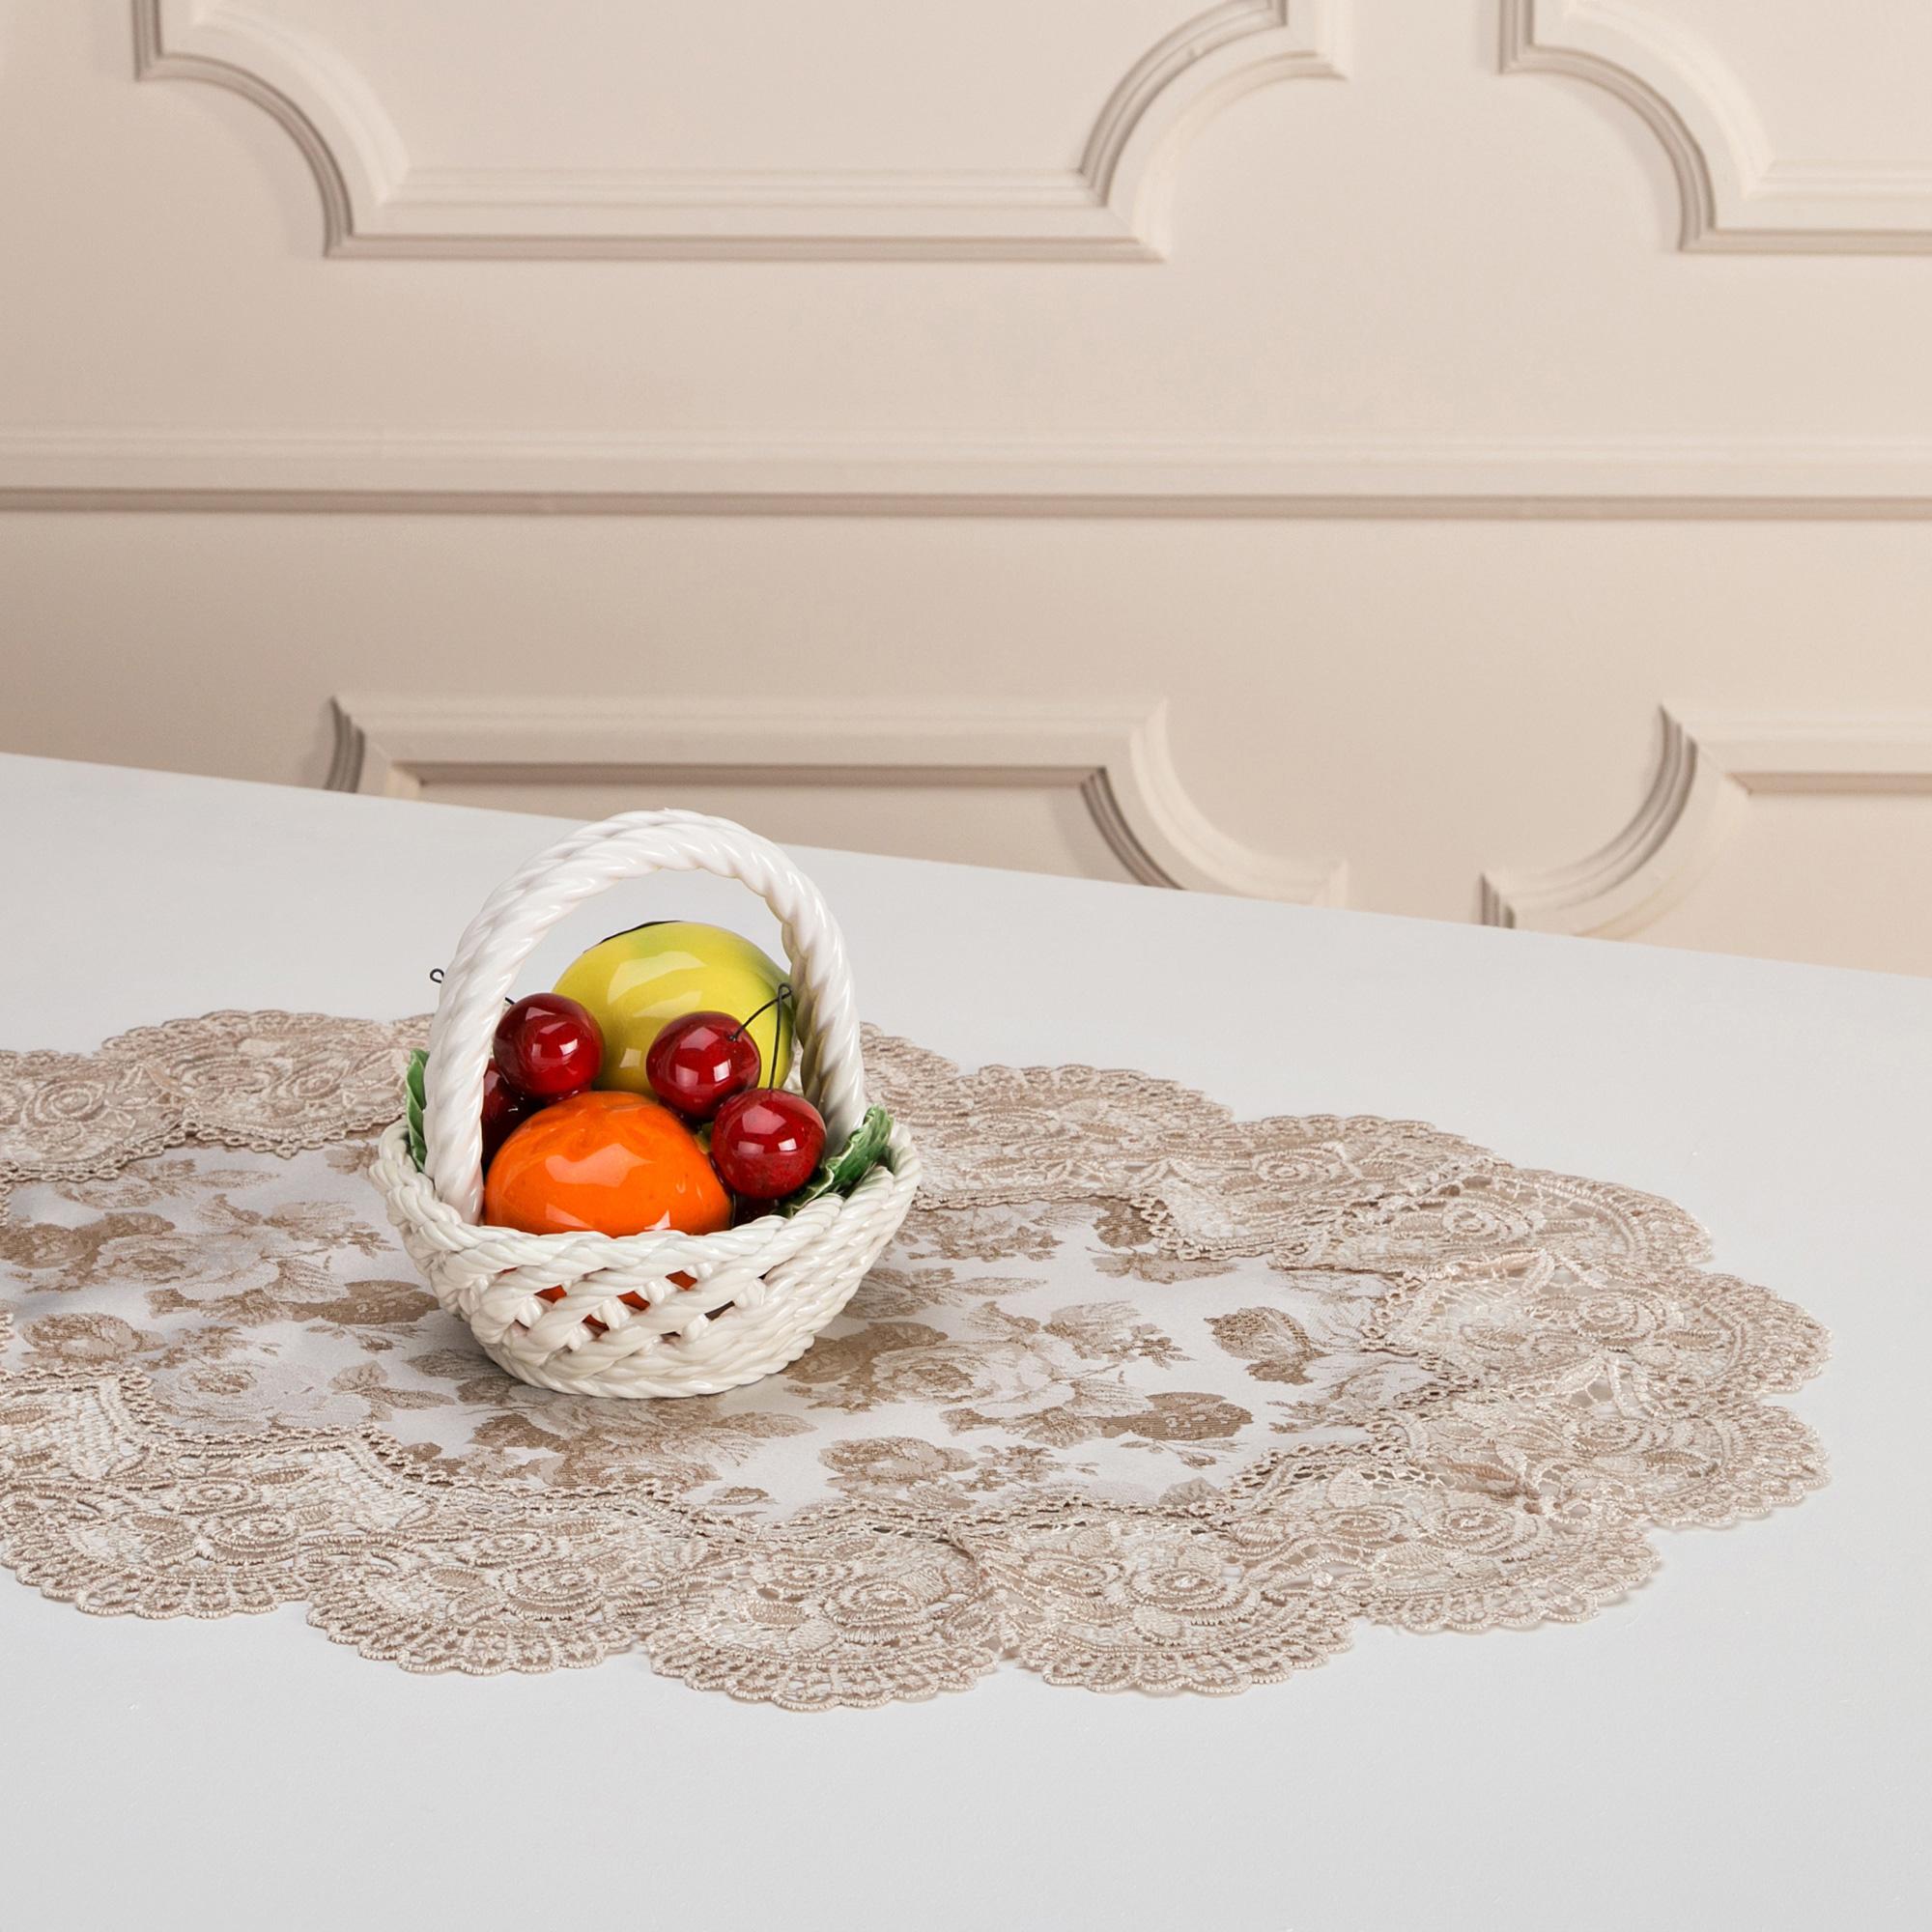 Скатерти и салфетки Arti-M Салфетки Merari (40х60 см) трусы стринг sloggi цвет черный